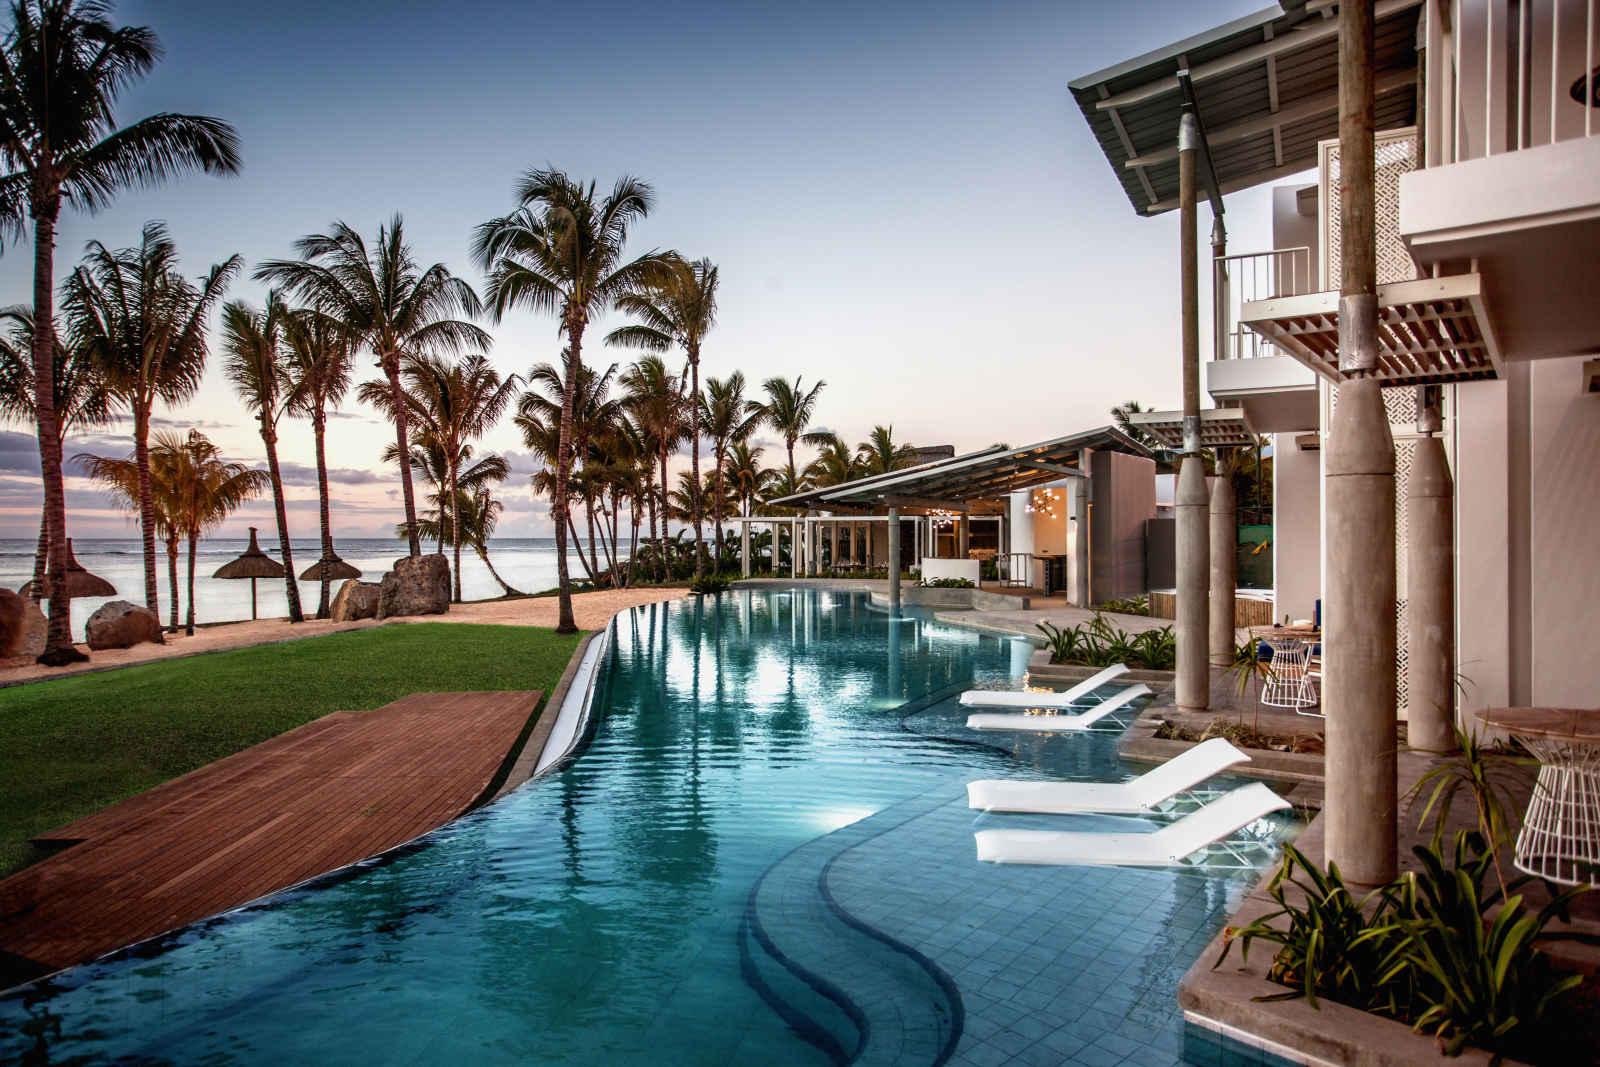 Victoria Beachcomber Resort & Spa - 4.5* - voyage  - sejour